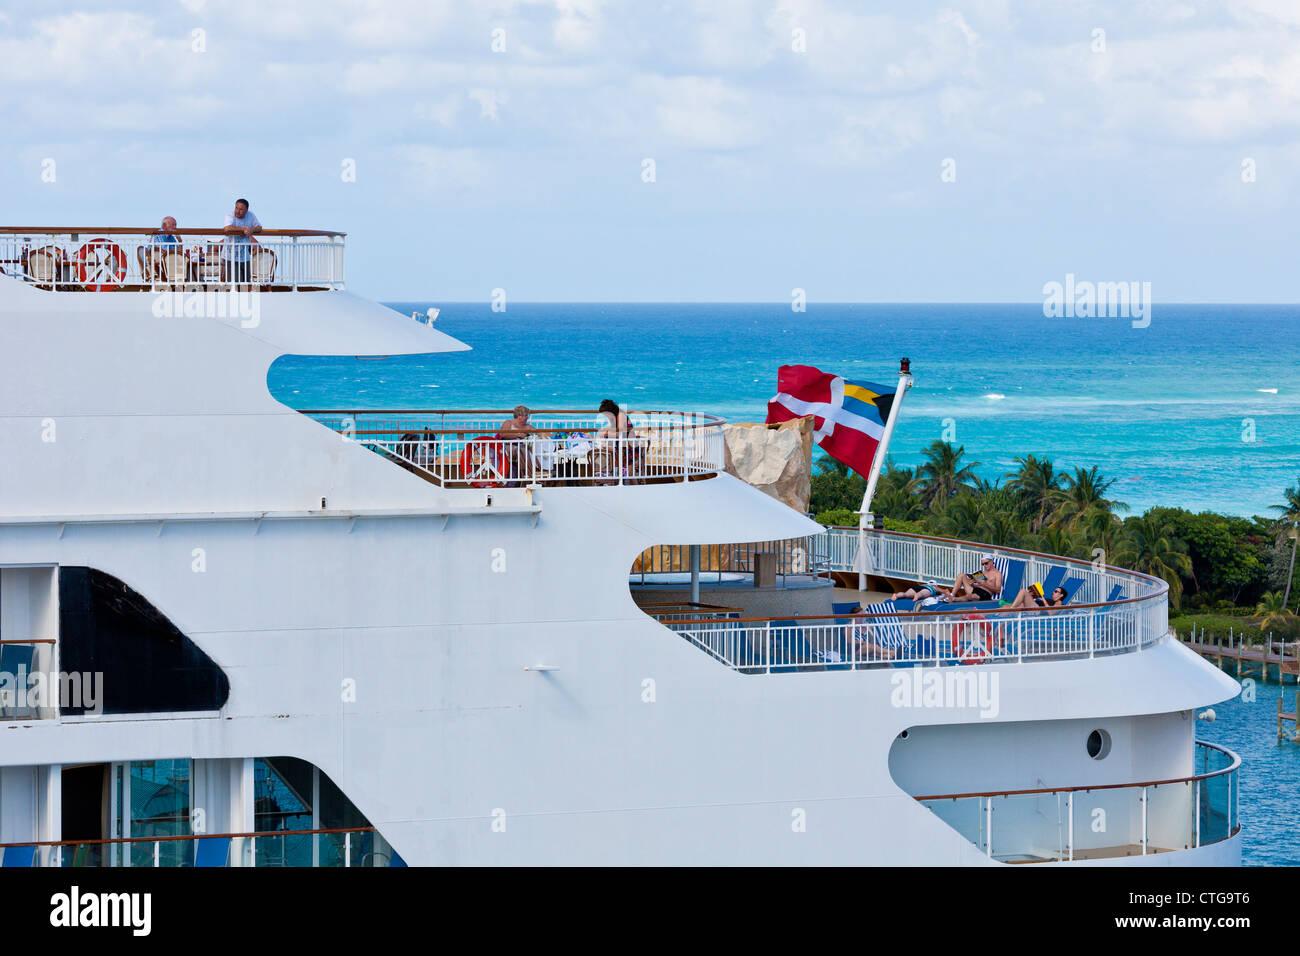 Cruise ship passengers lounging on multiple decks at port in Nassau, Bahamas - Stock Image